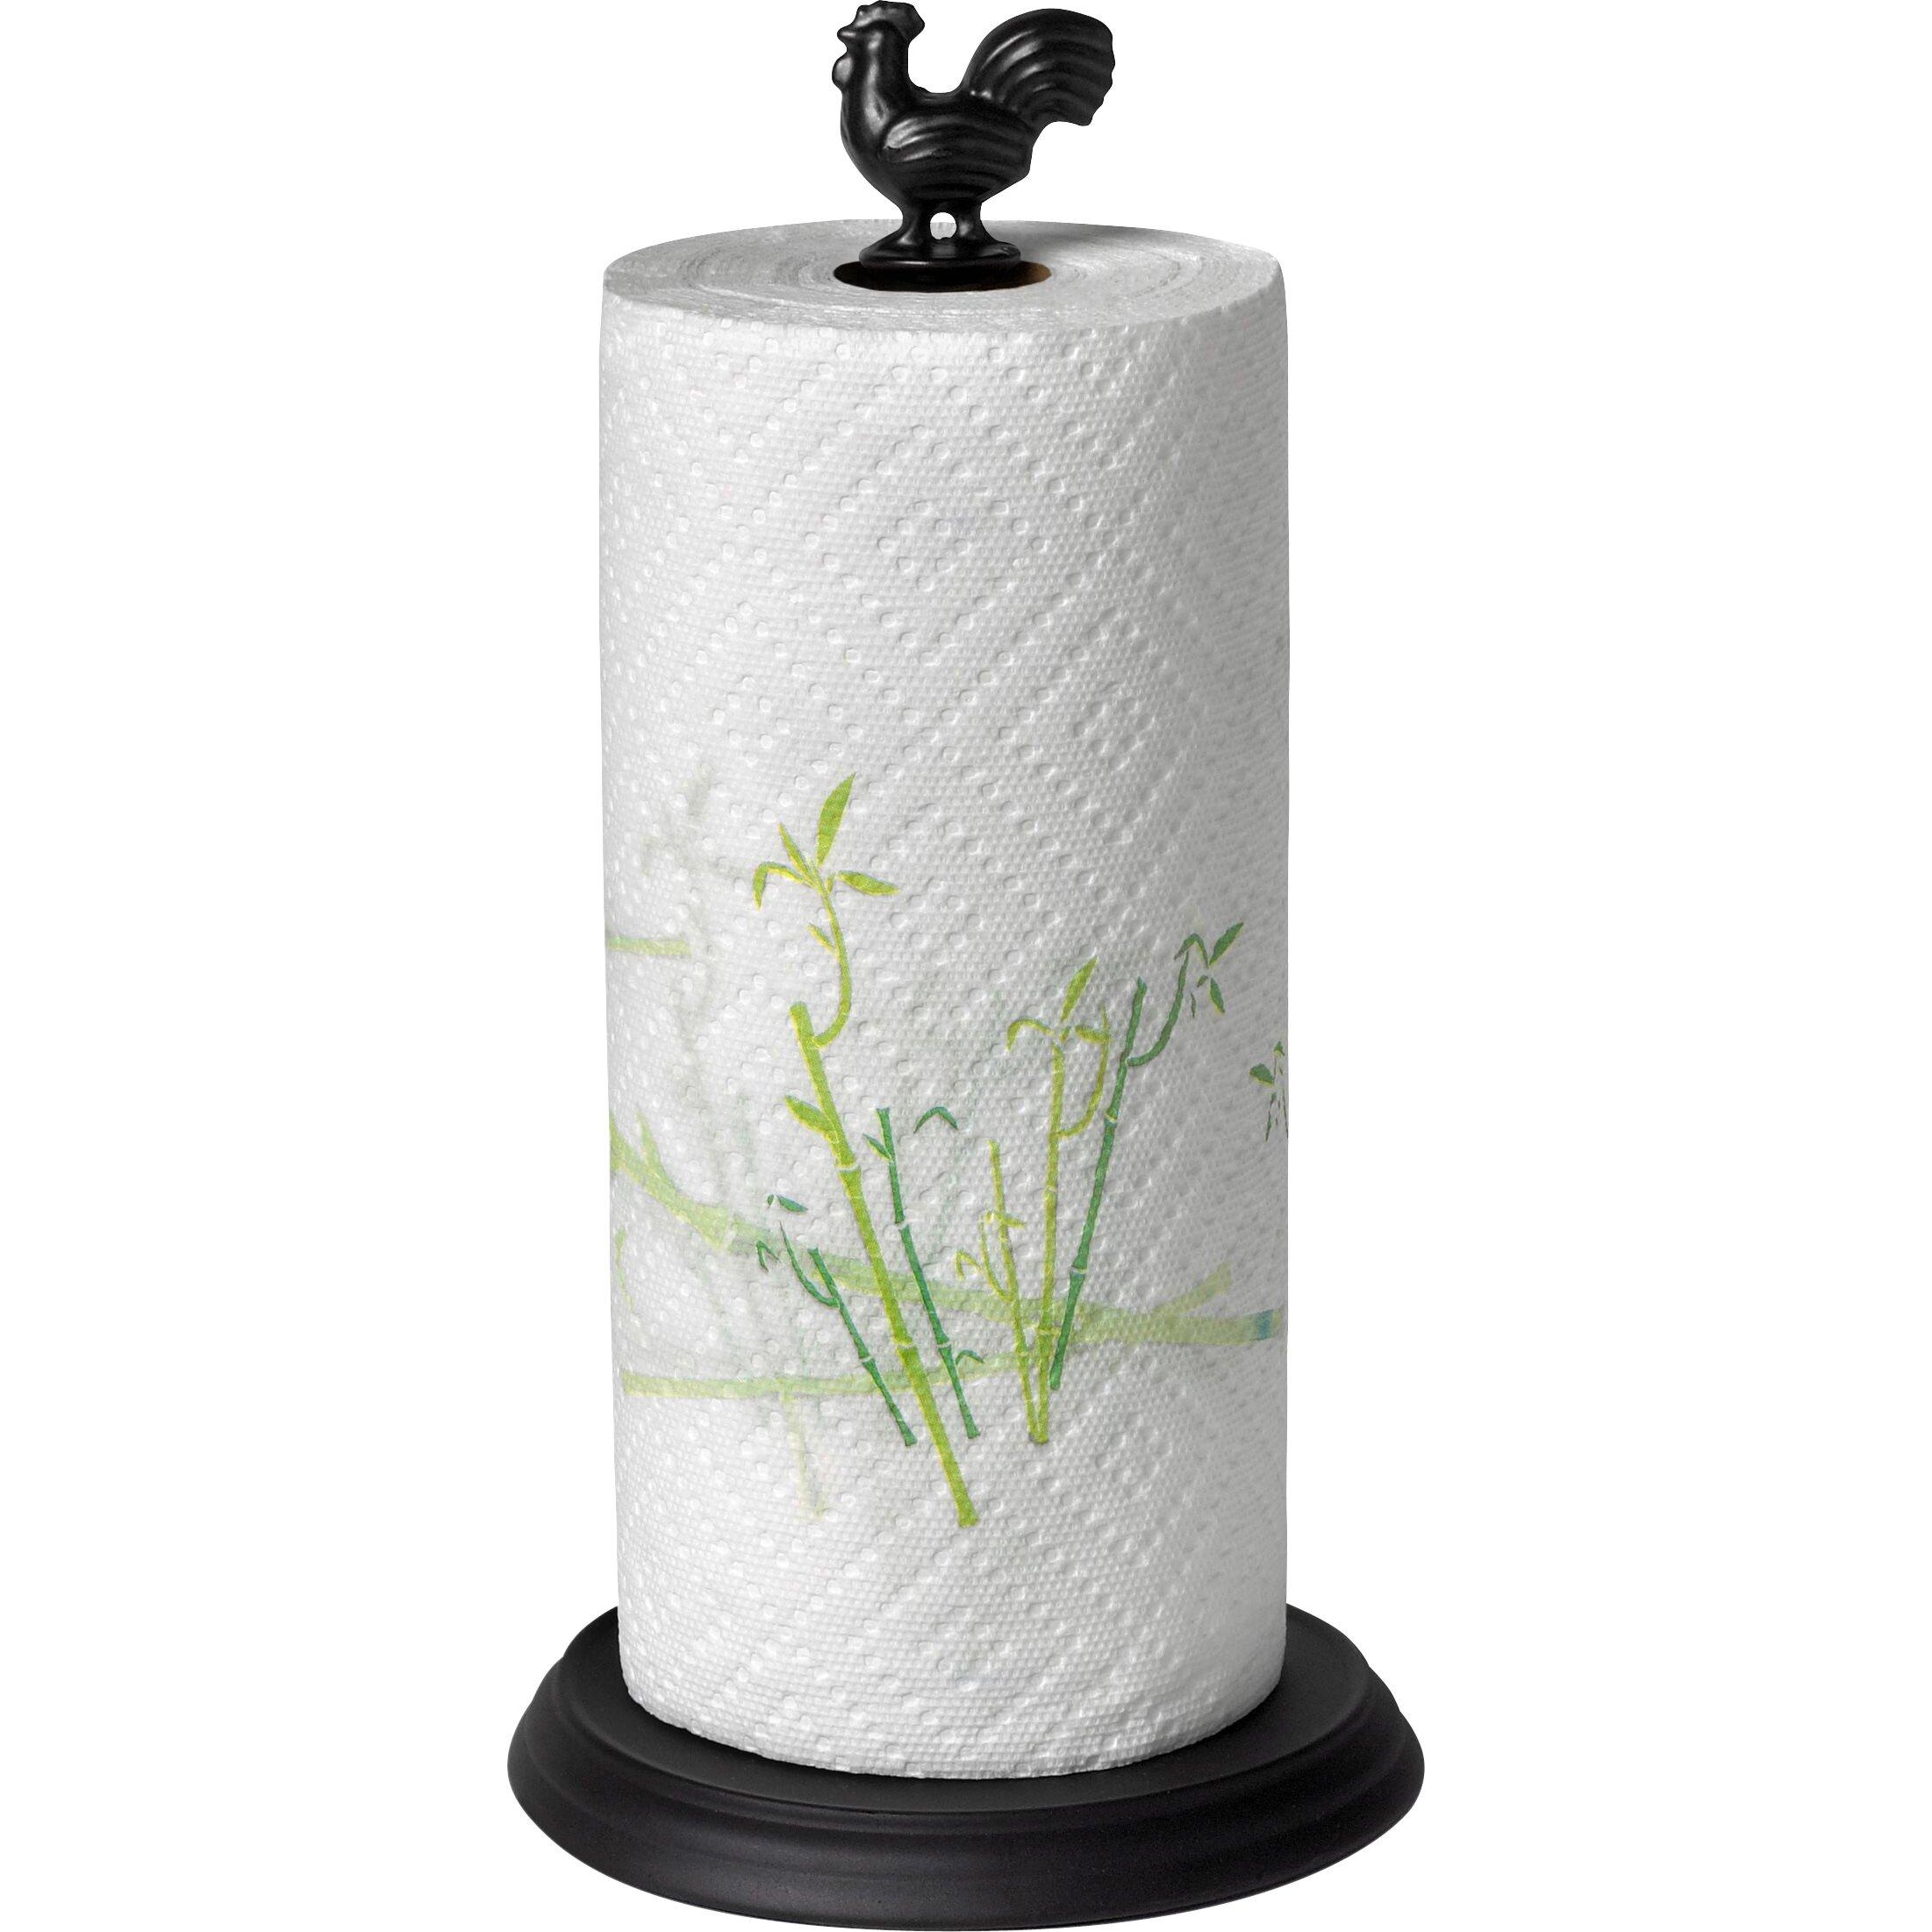 Spectrum Diversified Rooster Paper Towel Holder In Black